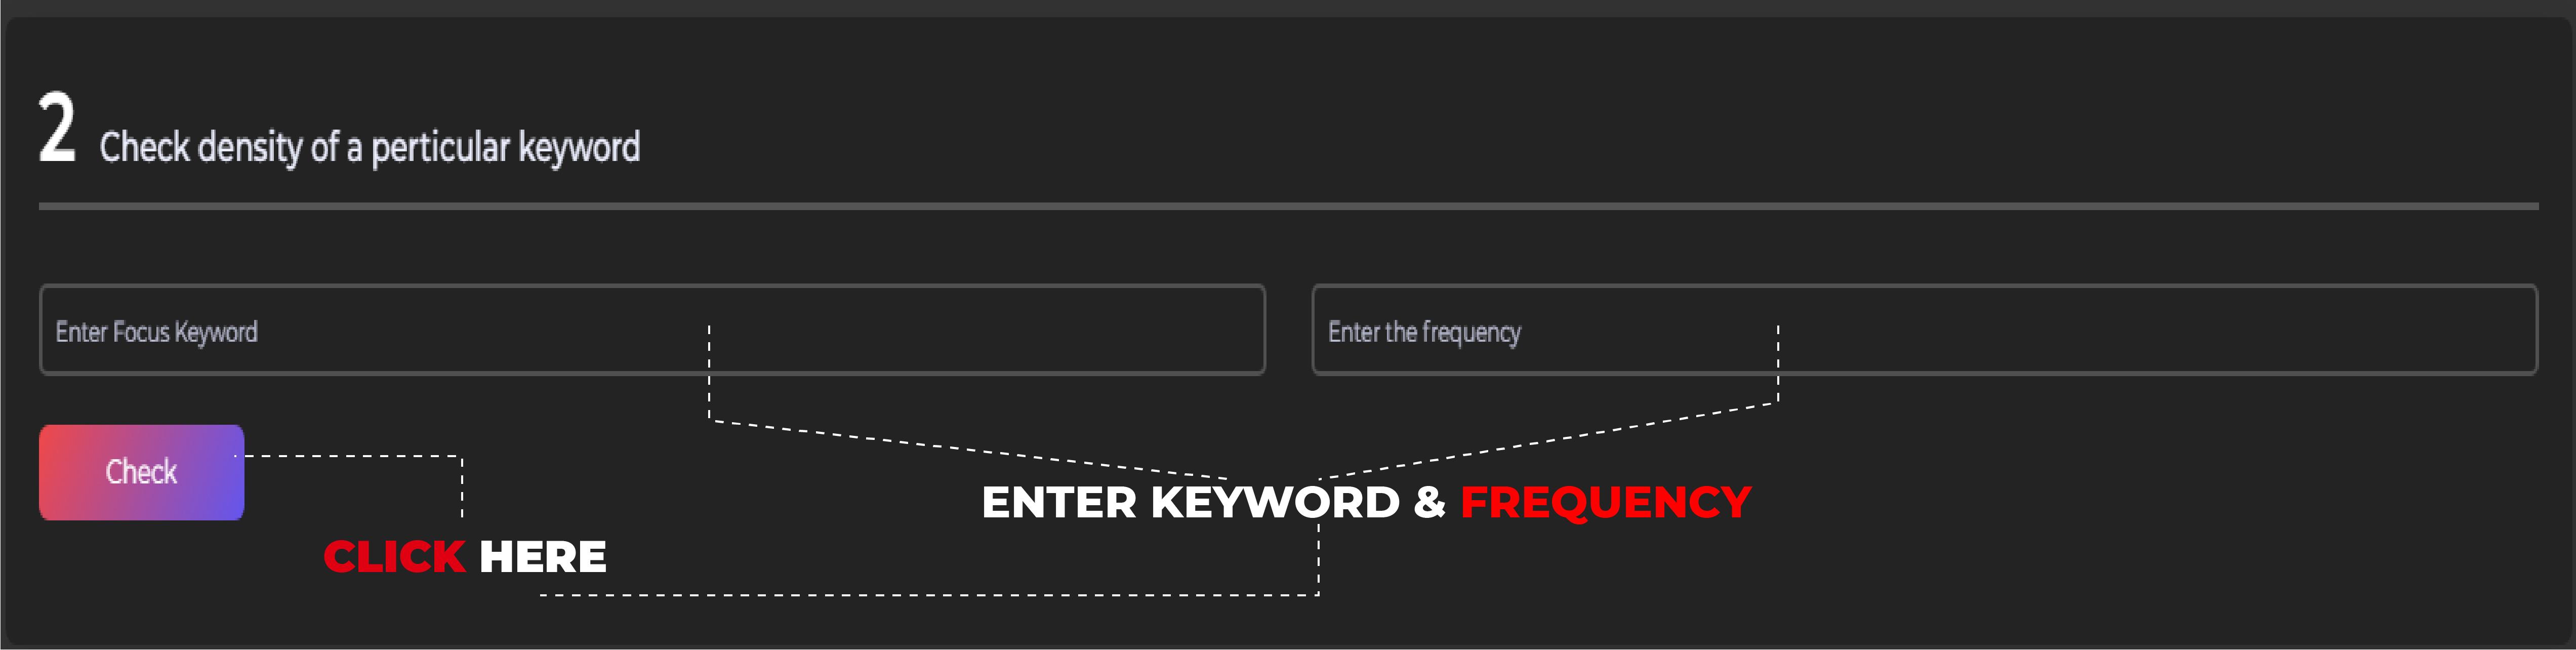 check keyword